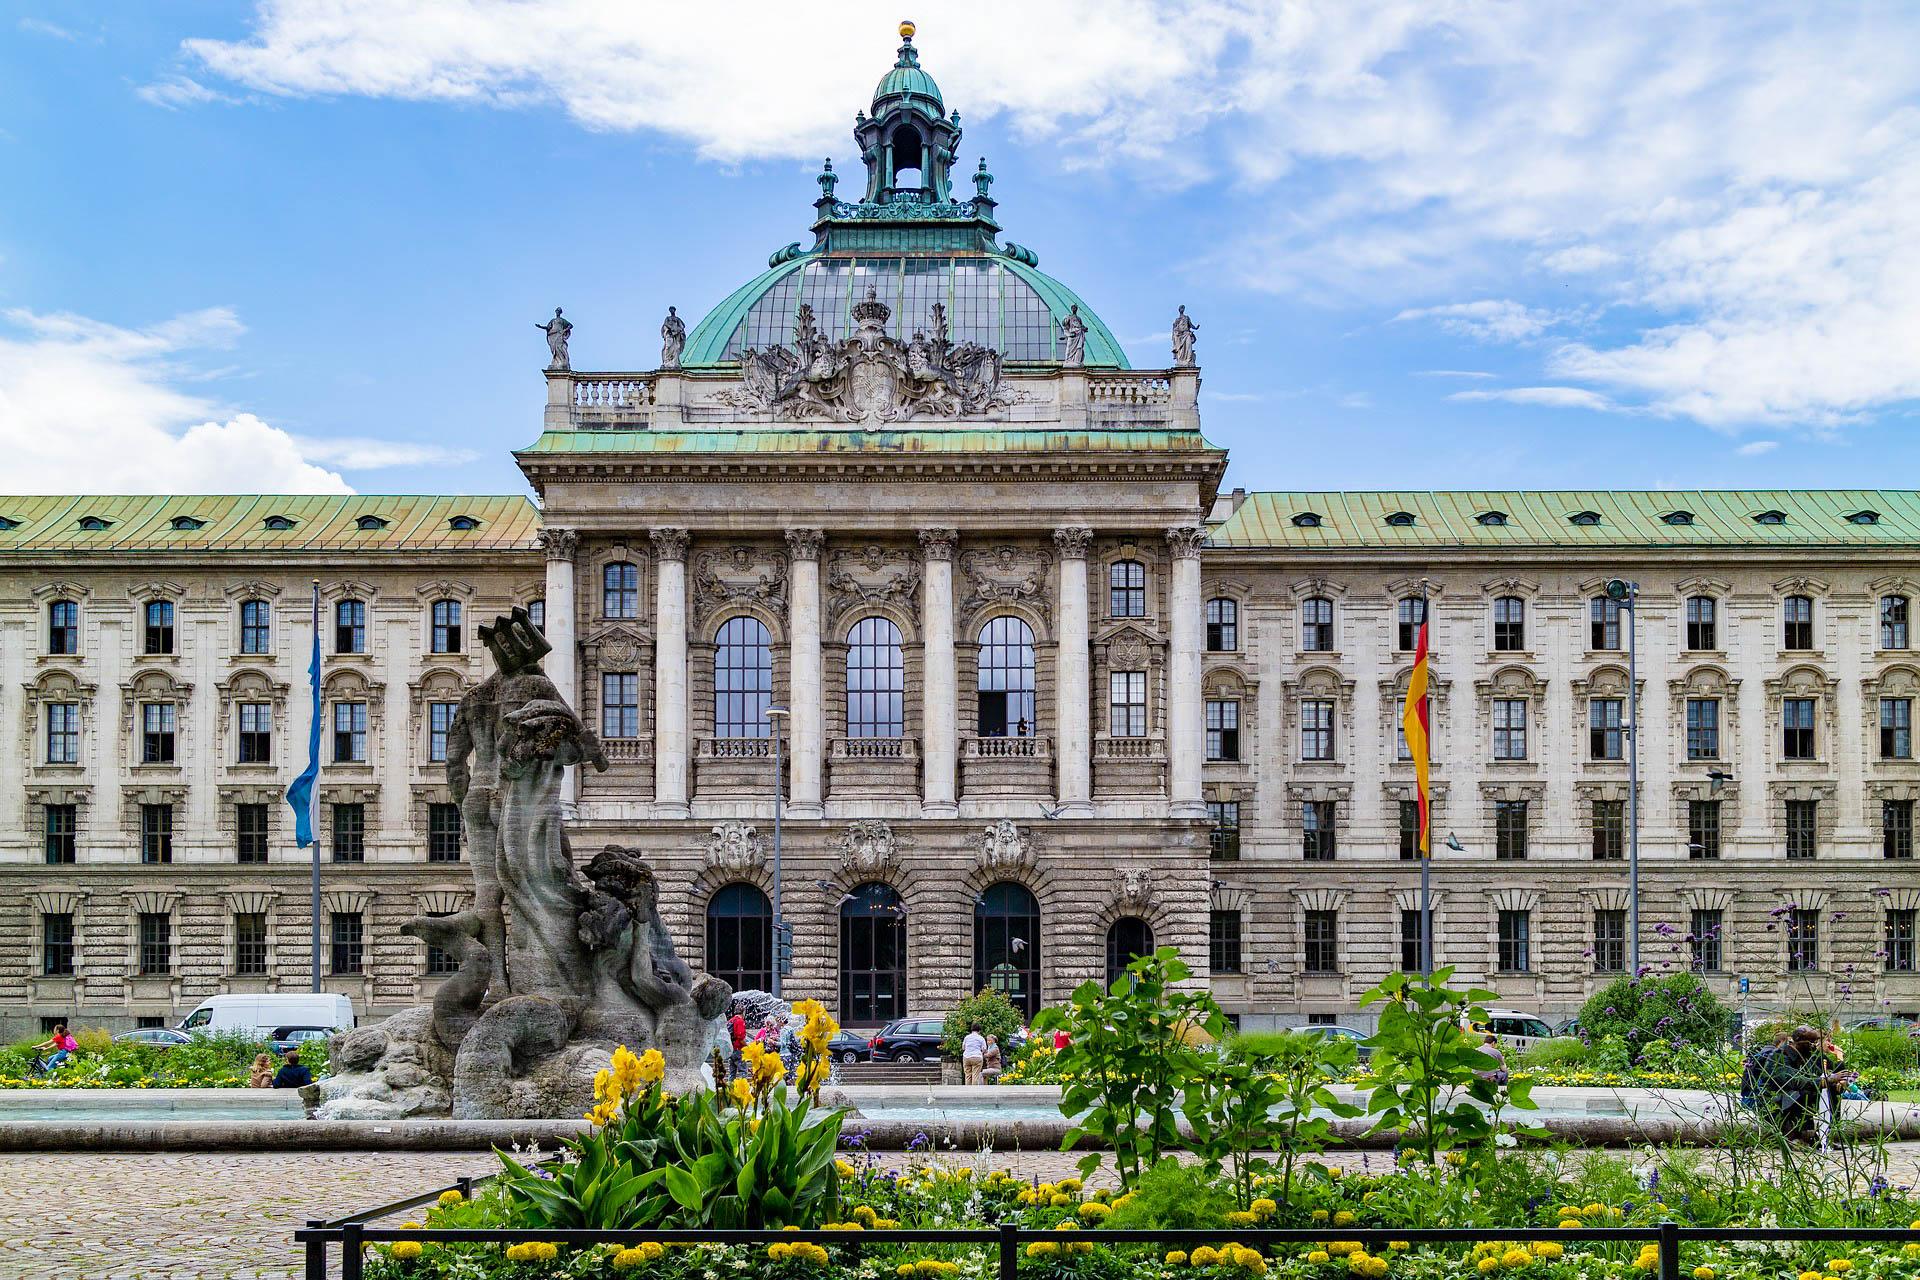 Німеччина Мюнхен палац юстиції